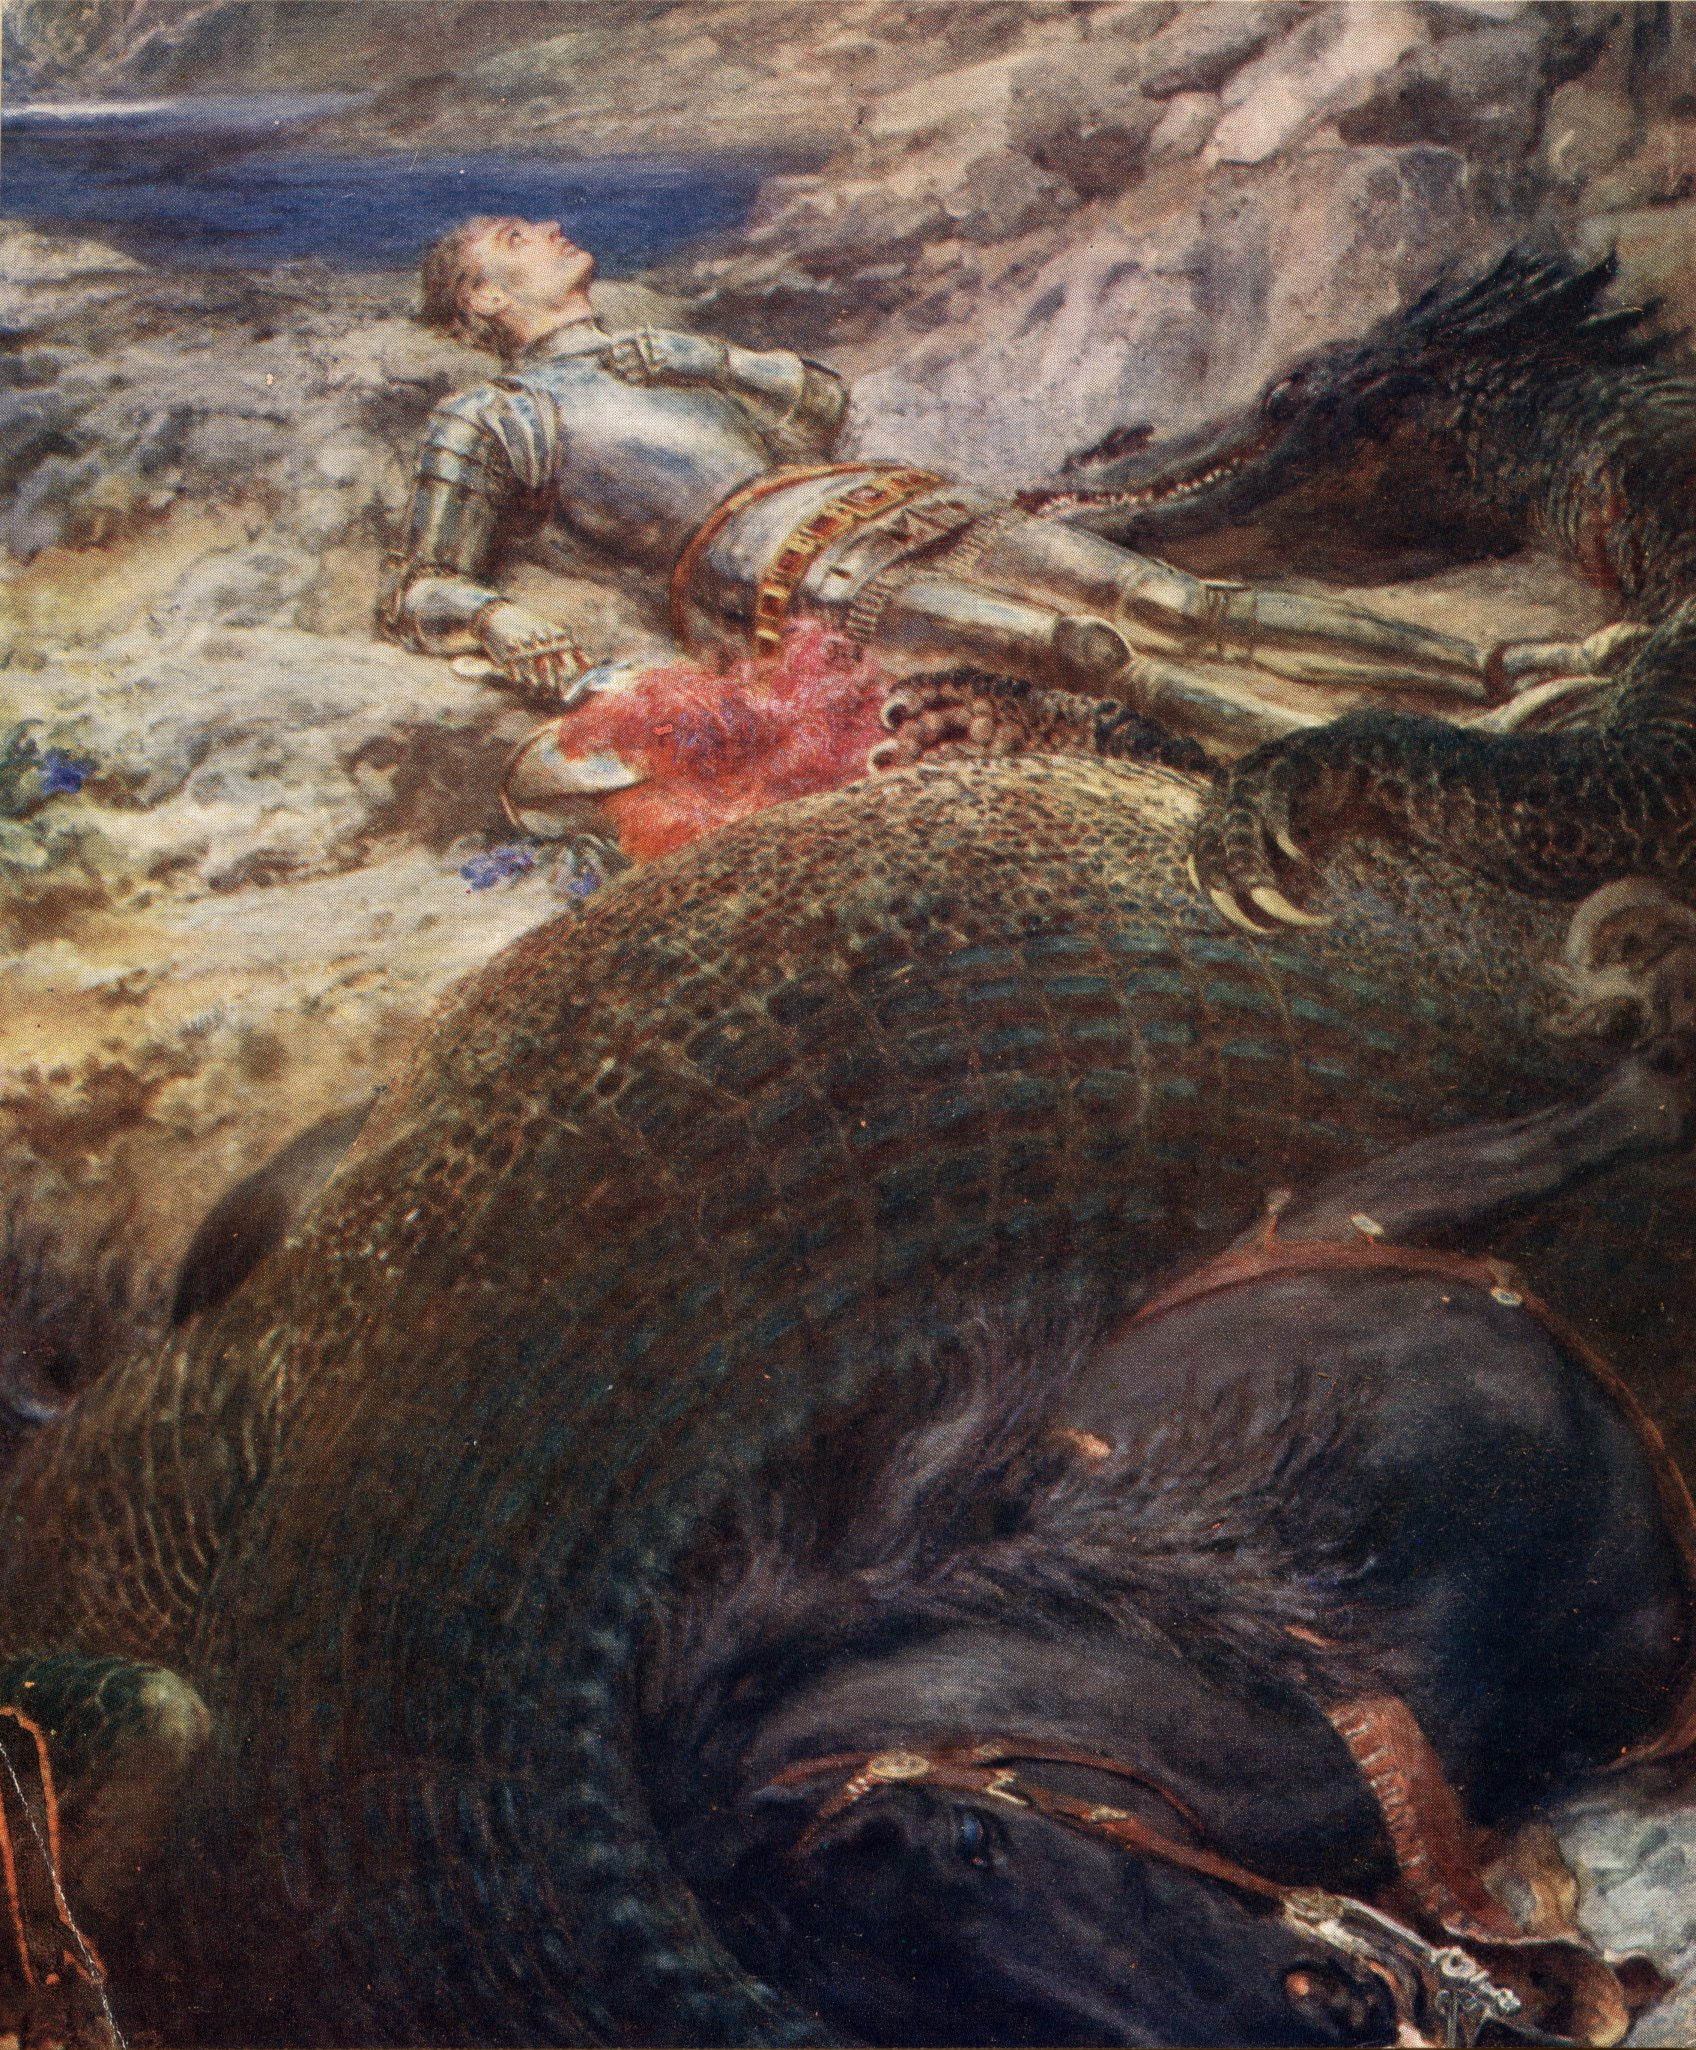 St._George_and_the_Dragon_-_Briton_Riviere